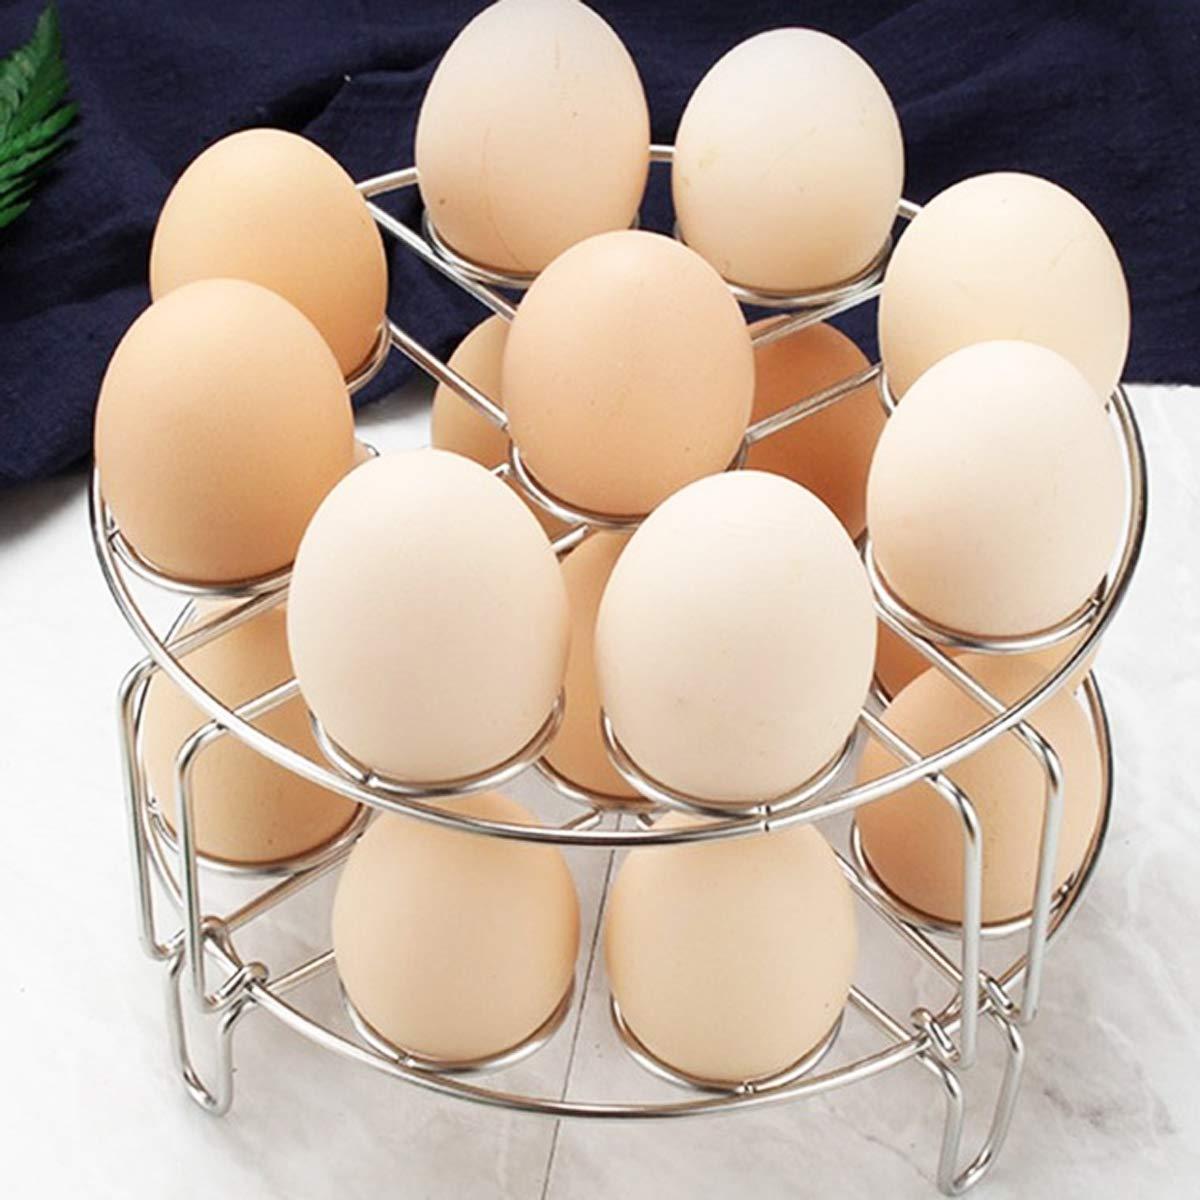 2 Pack Baitaihem Stainless Steel Stackable Egg Steamer Rack Trivet for Instant Pot Pressure Cooker Accessories